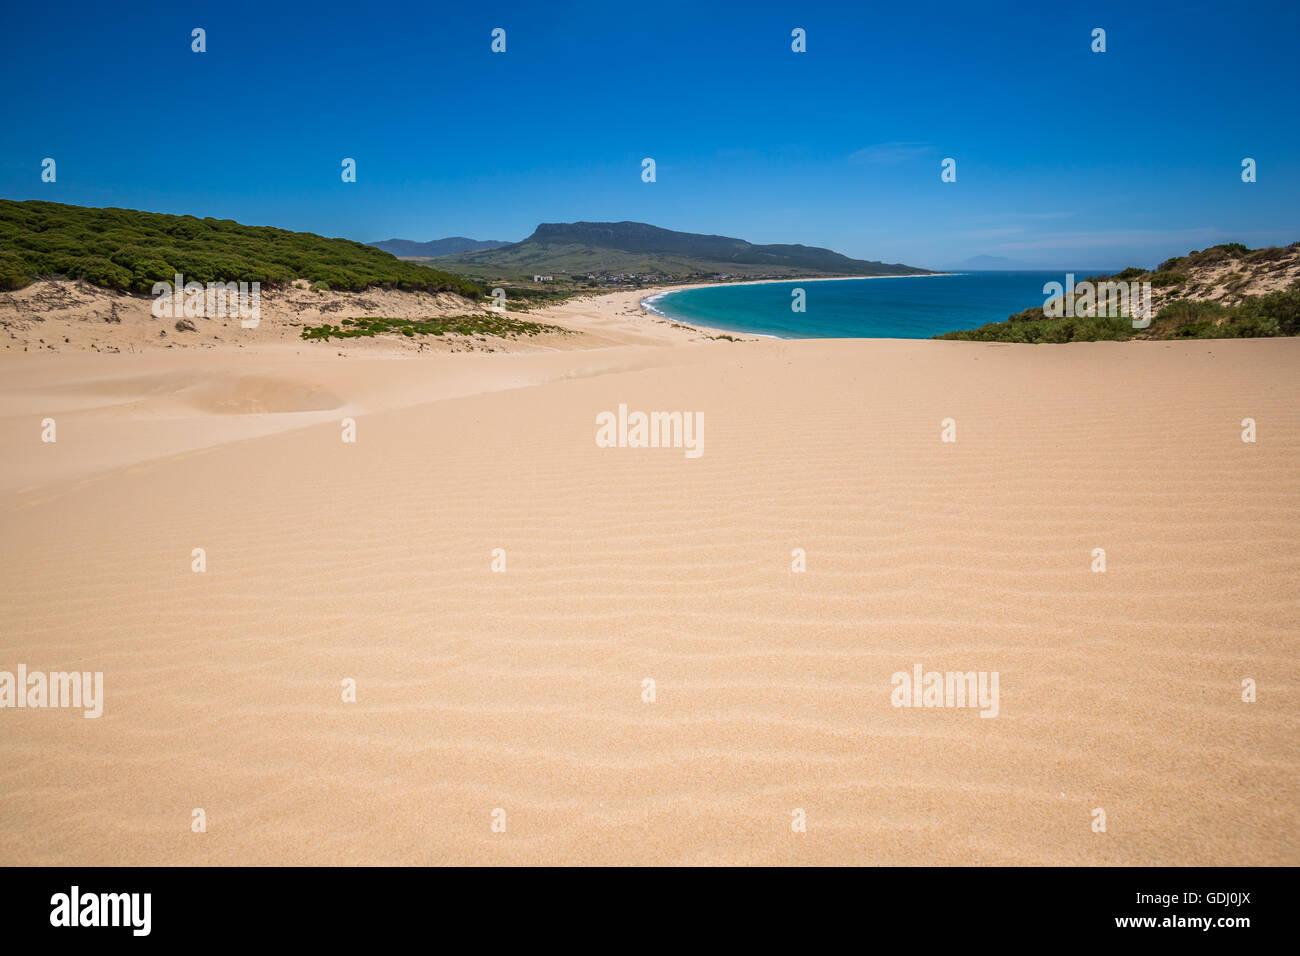 Sand dune of Bolonia beach, province Cadiz, Andalucia, Spain Stock Photo